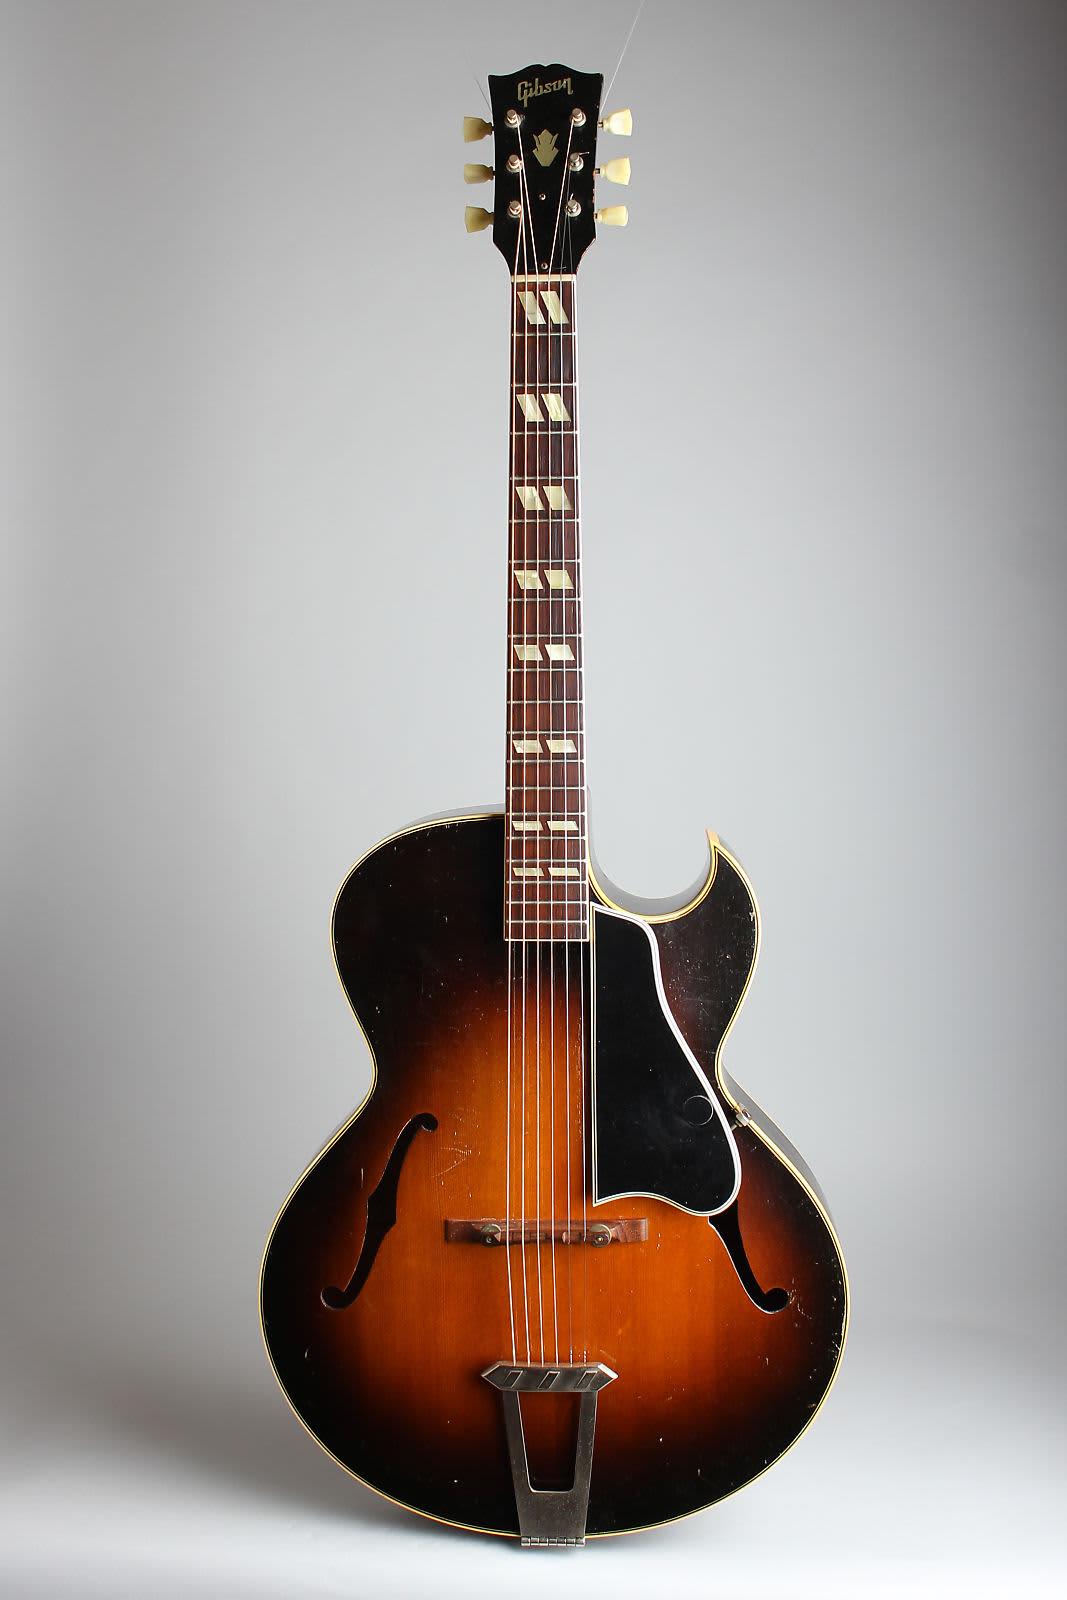 gibson l 4c arch top acoustic guitar 1950 ser a 5142 reverb. Black Bedroom Furniture Sets. Home Design Ideas